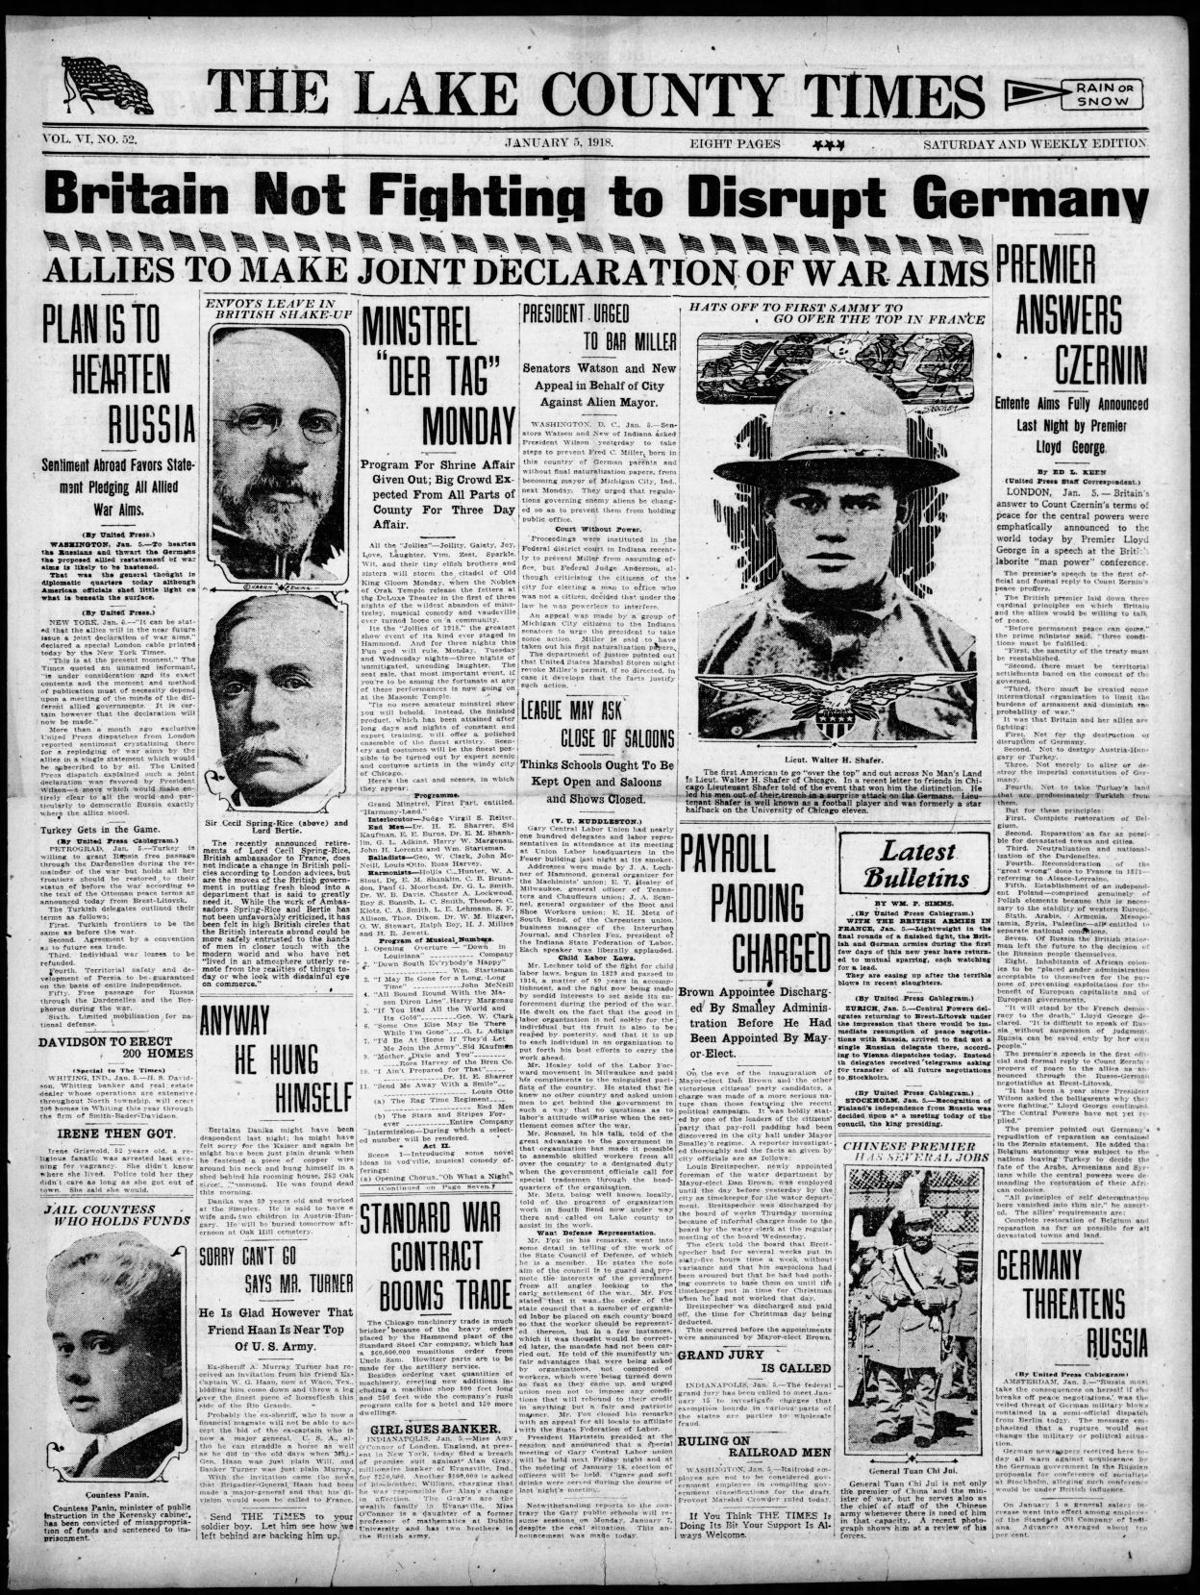 Jan. 5, 1918: Payroll Padding Charged